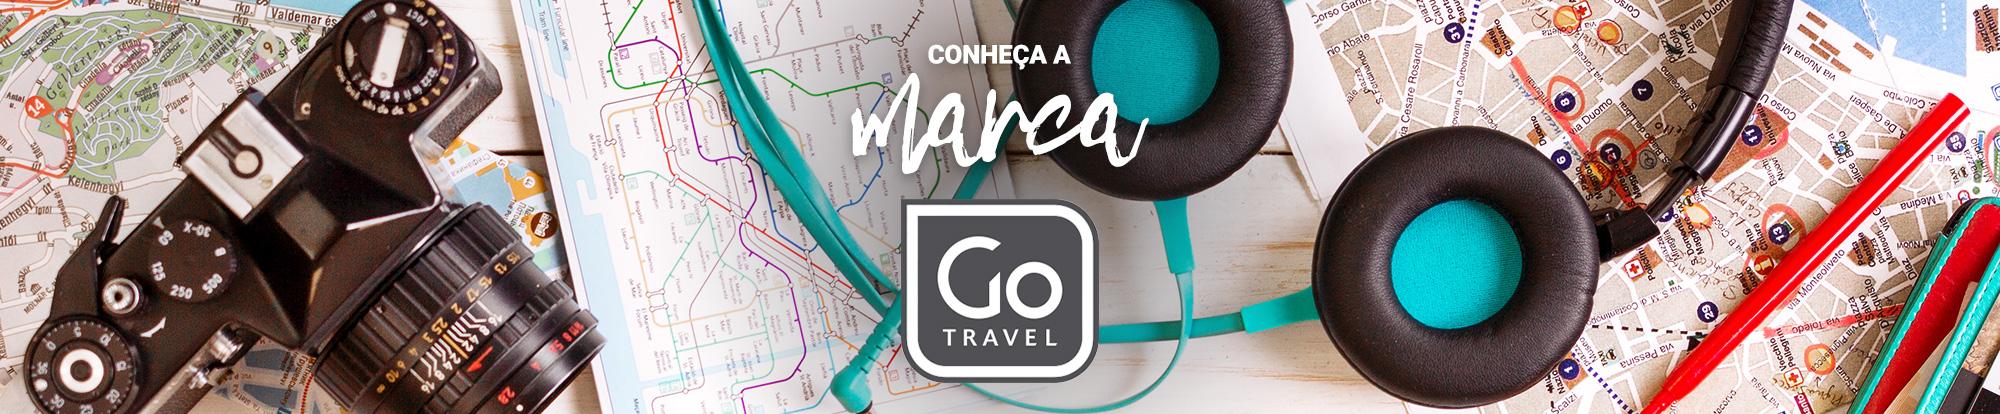 Banner Marca Go Travel